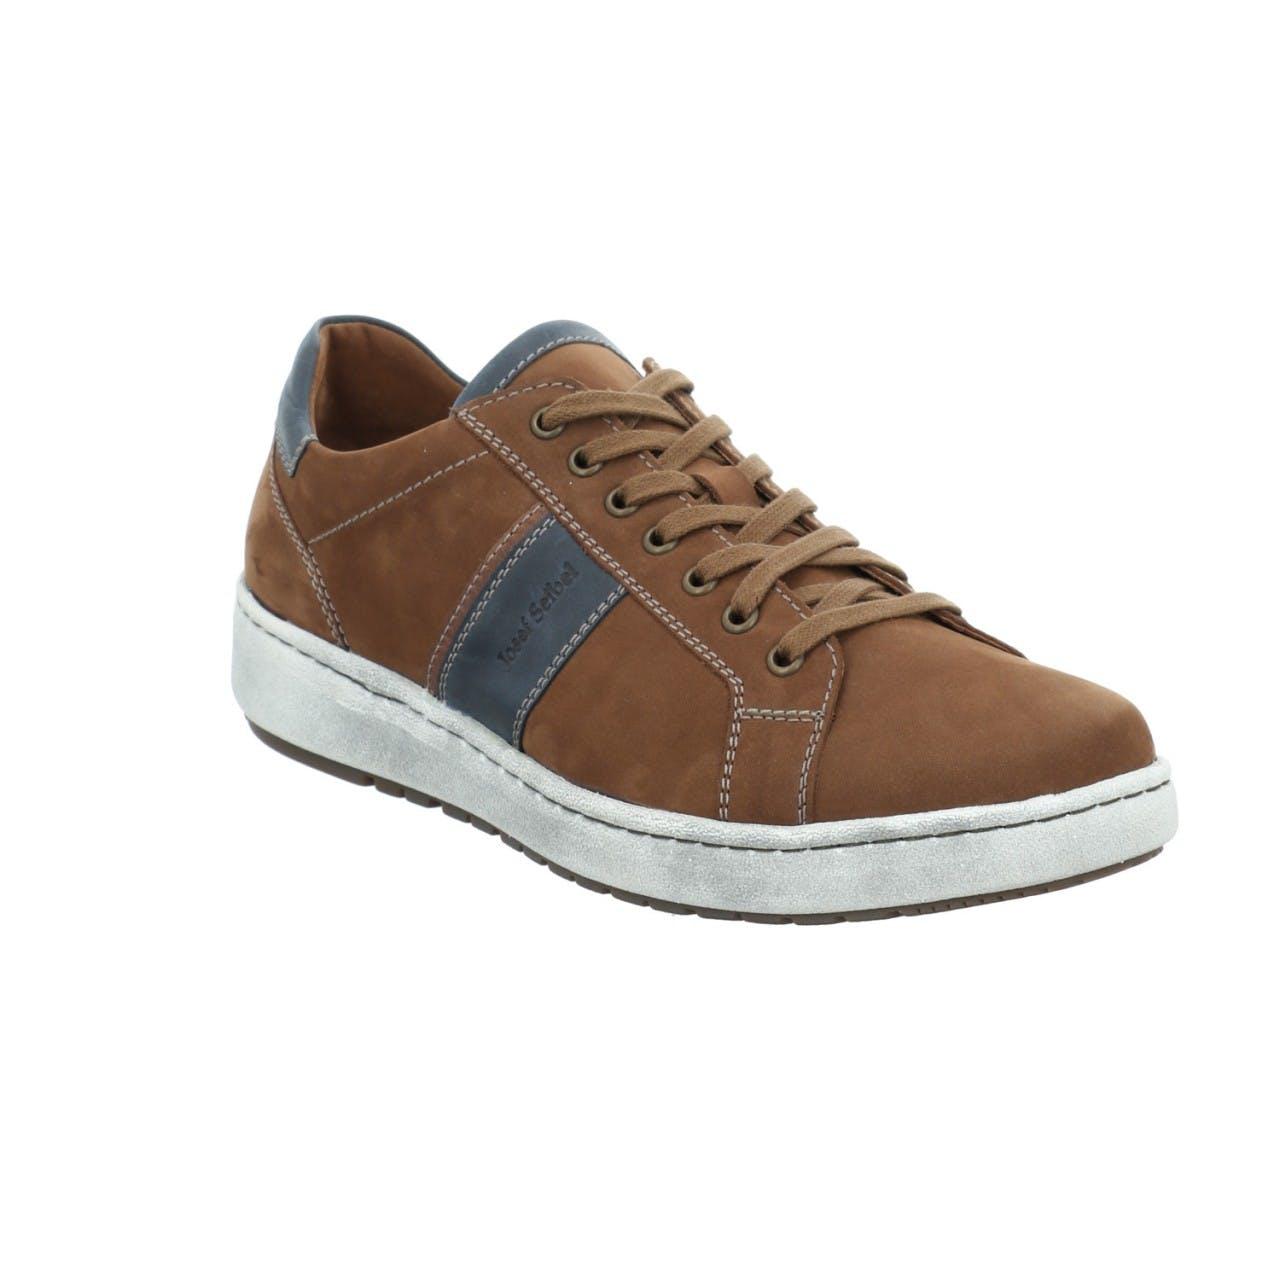 Josef Seibel Herren-Sneaker David 01 | braun